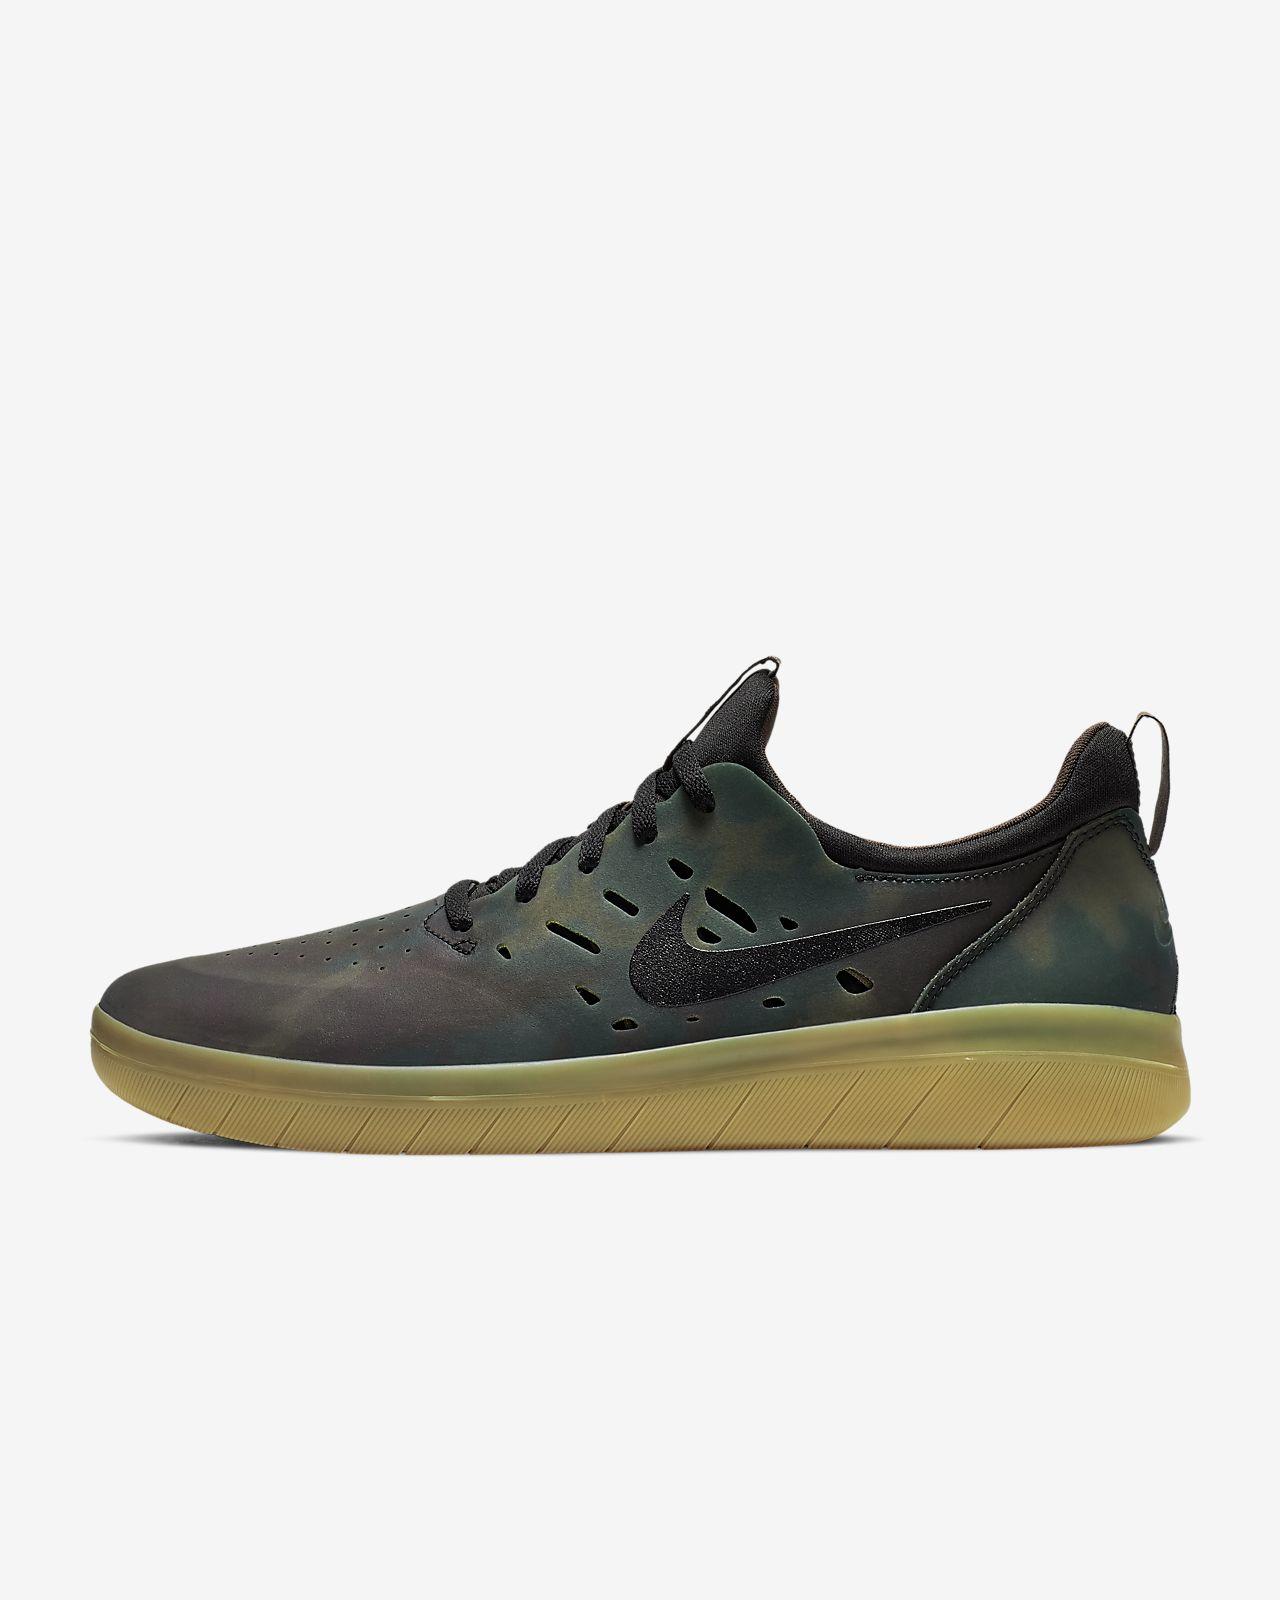 Chaussure de skateboard Nike SB Nyjah Free Premium